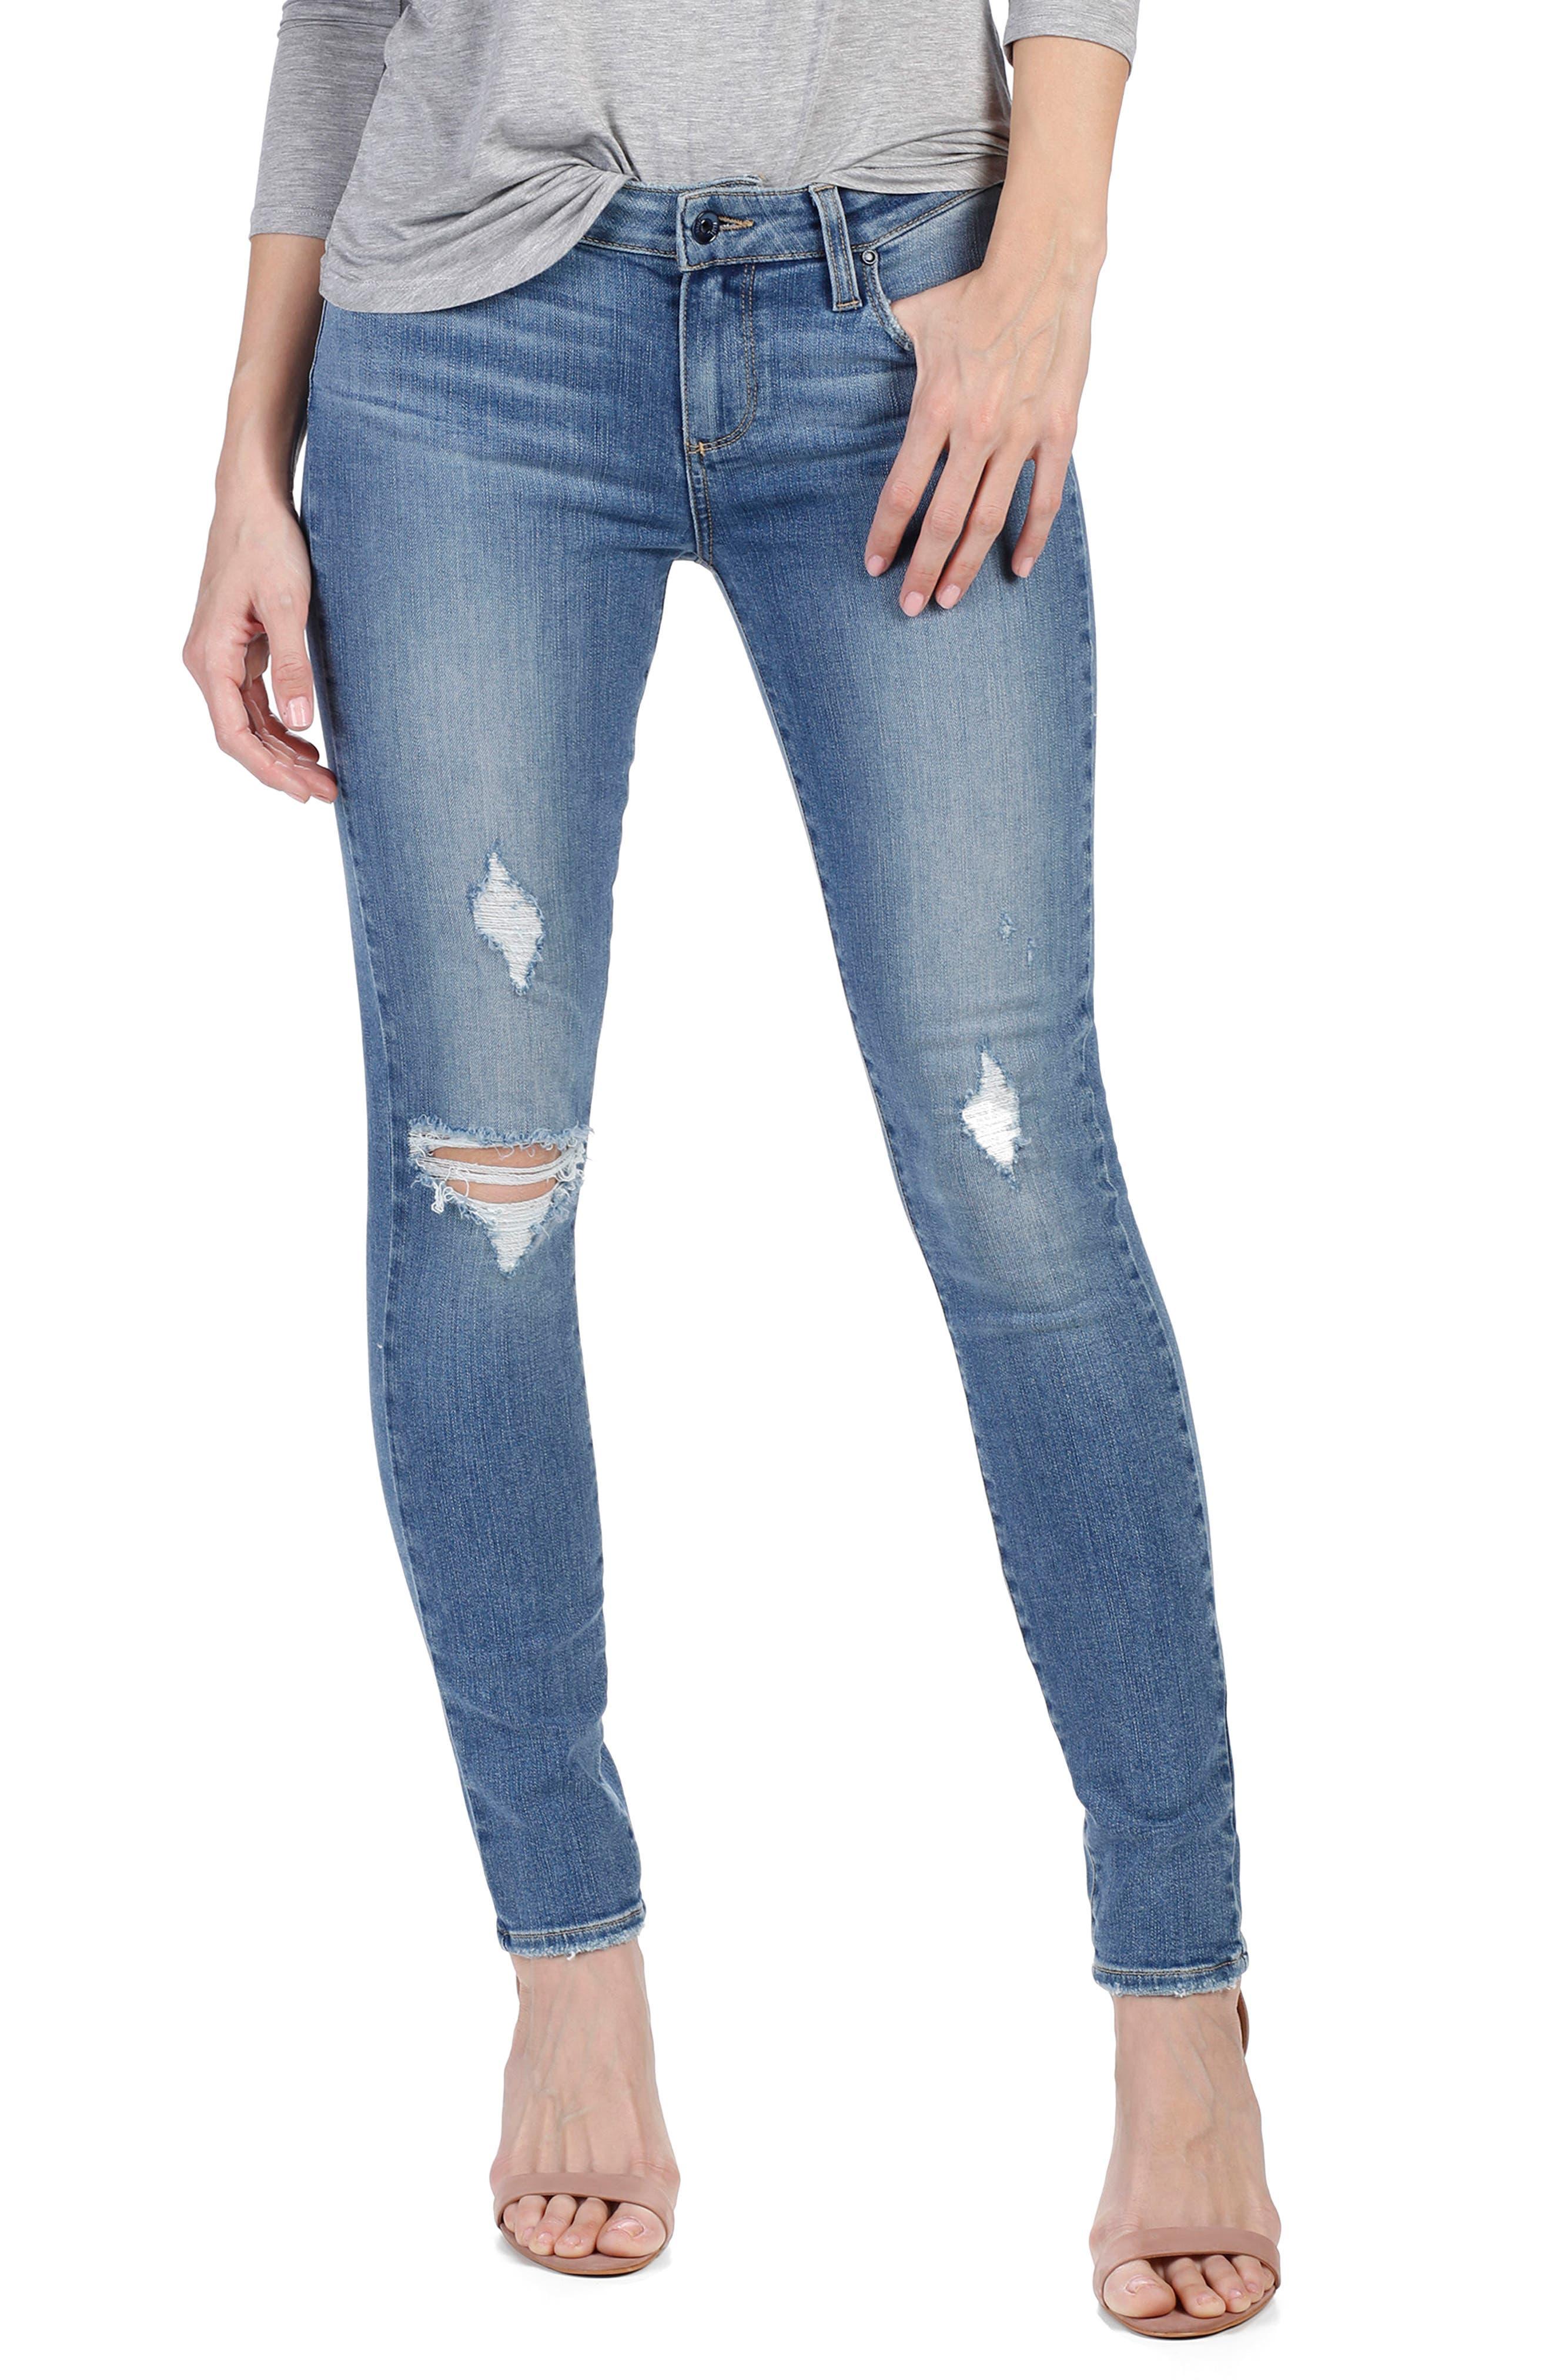 PAIGE Transcend - Verdugo Ultra Skinny Jeans (Sienna Destructed)